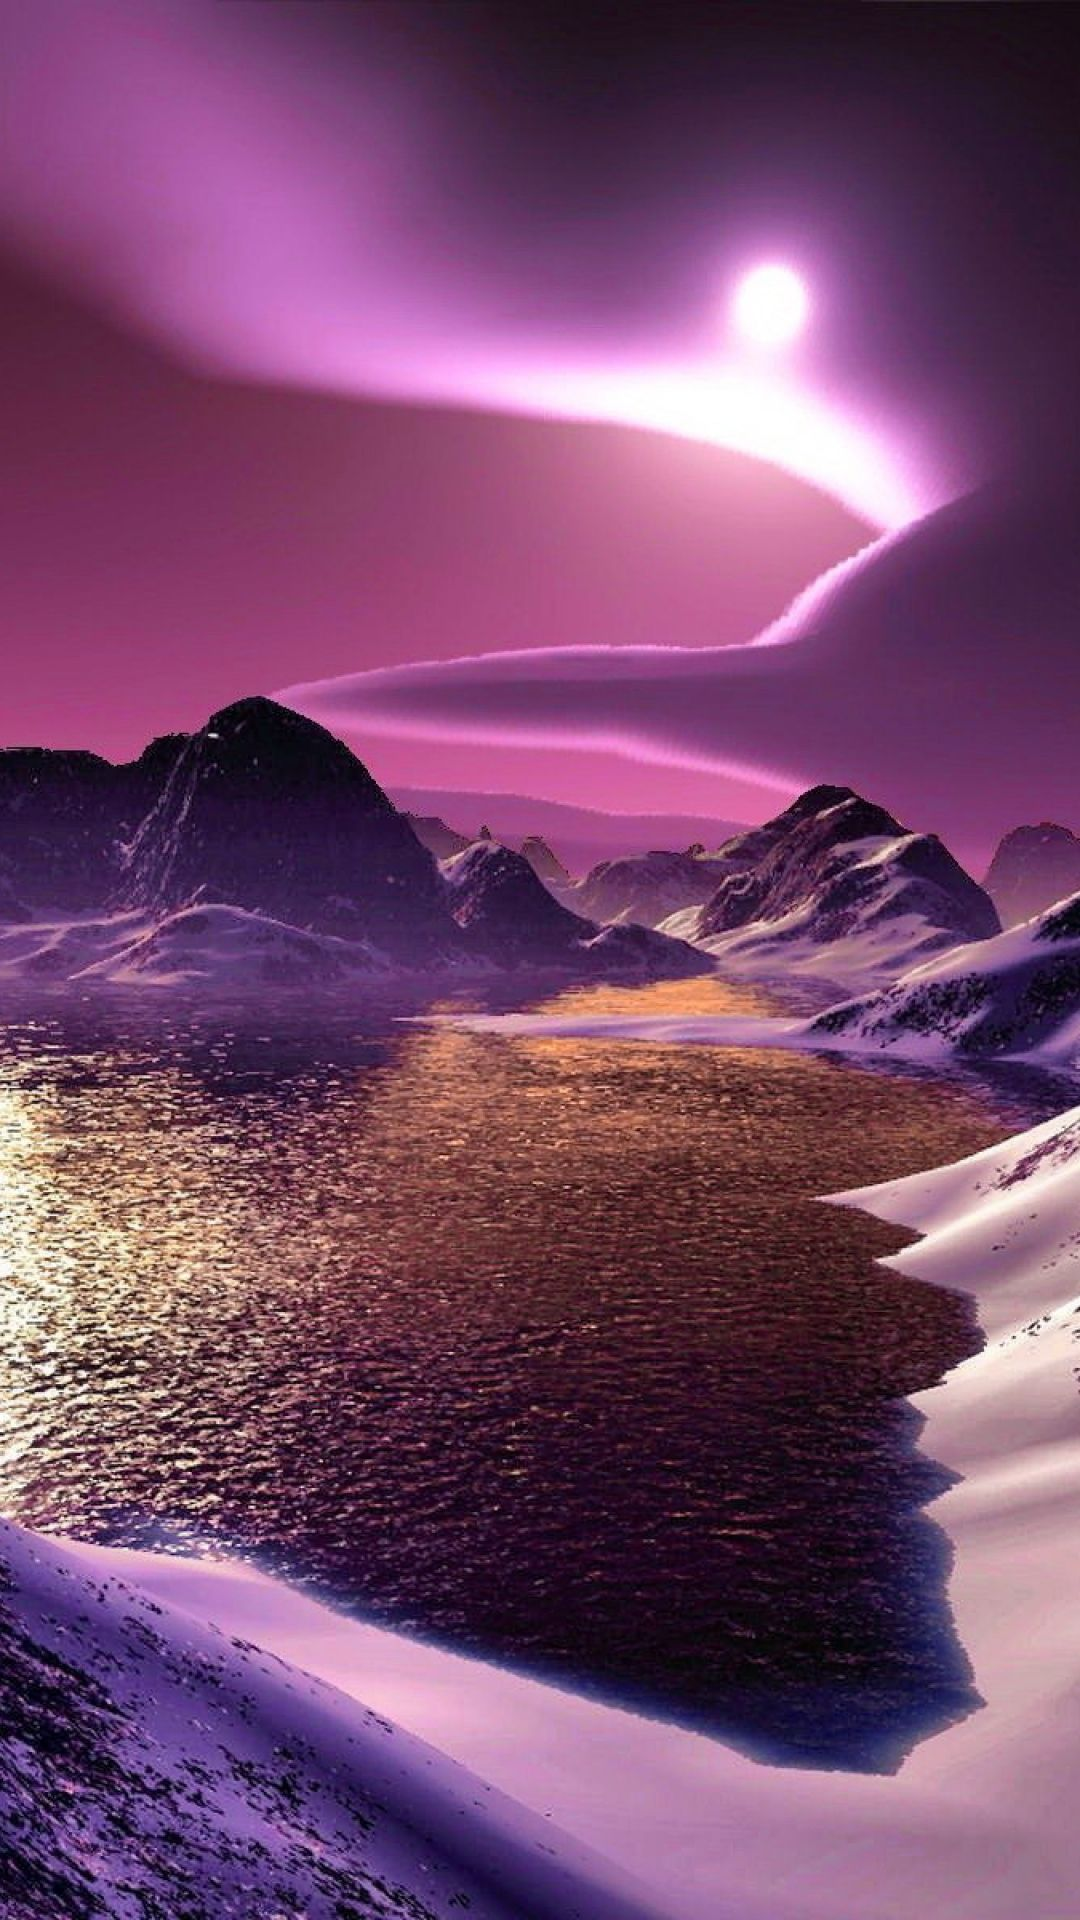 1080x1920 Wallpaper Mountains Lake Bottom Night Moon